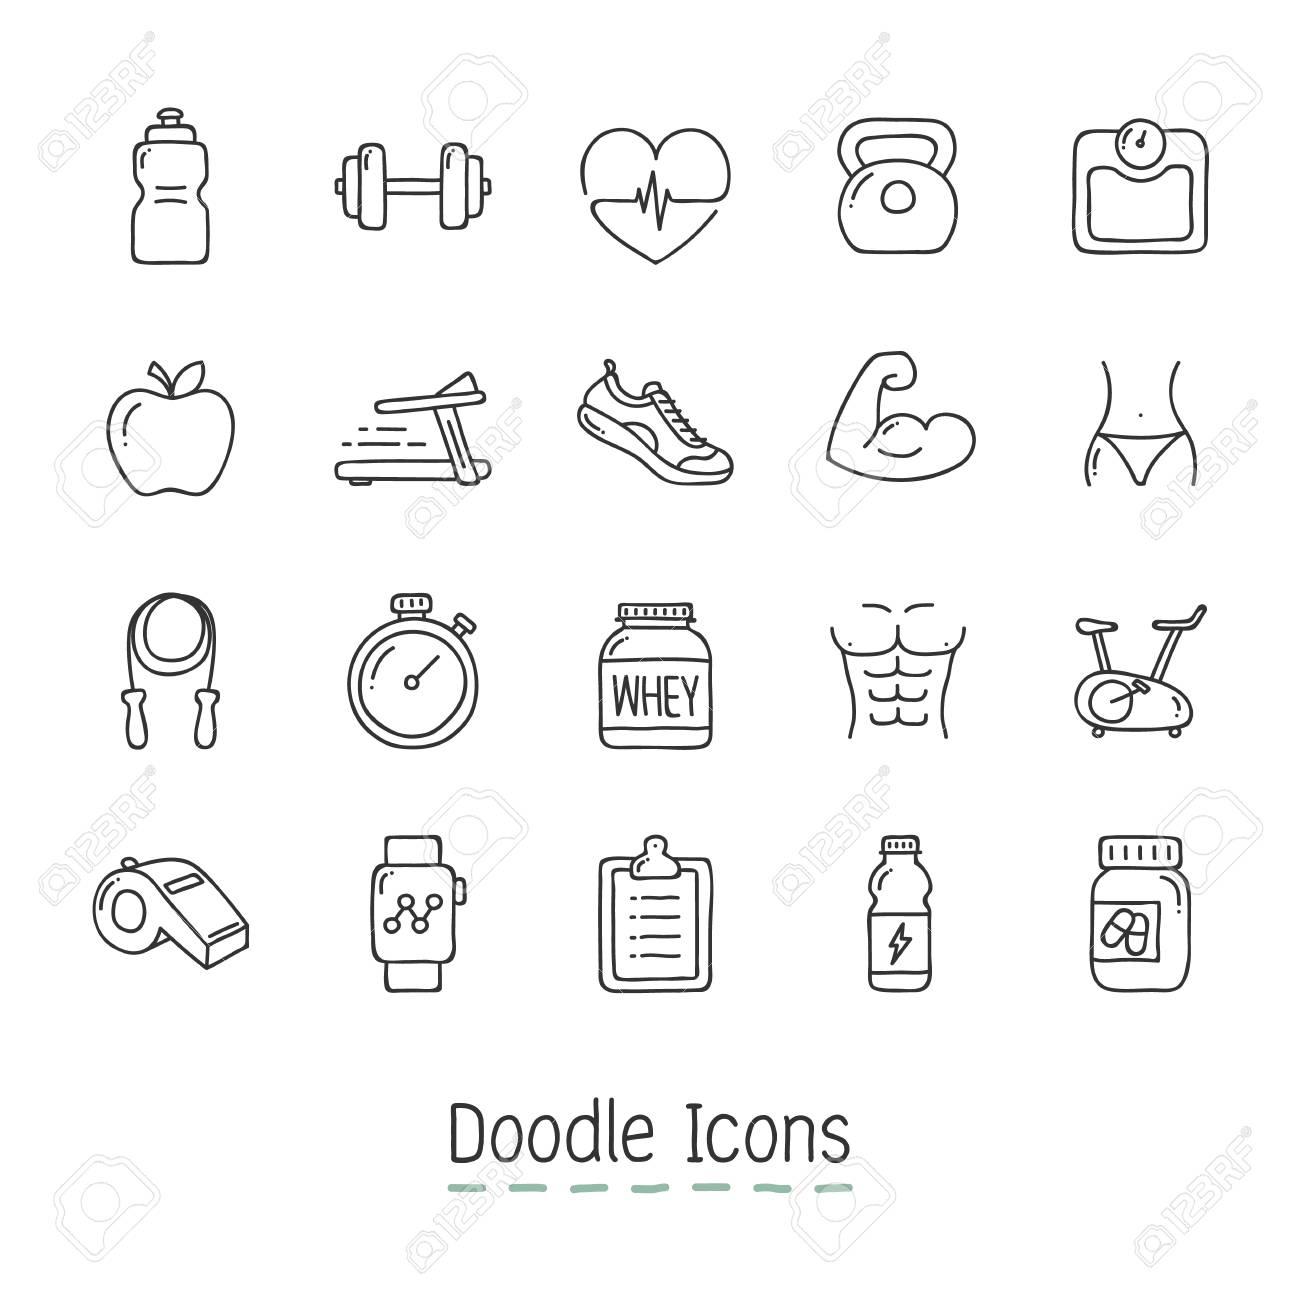 Hand Drawn Icon Set. - 126684971